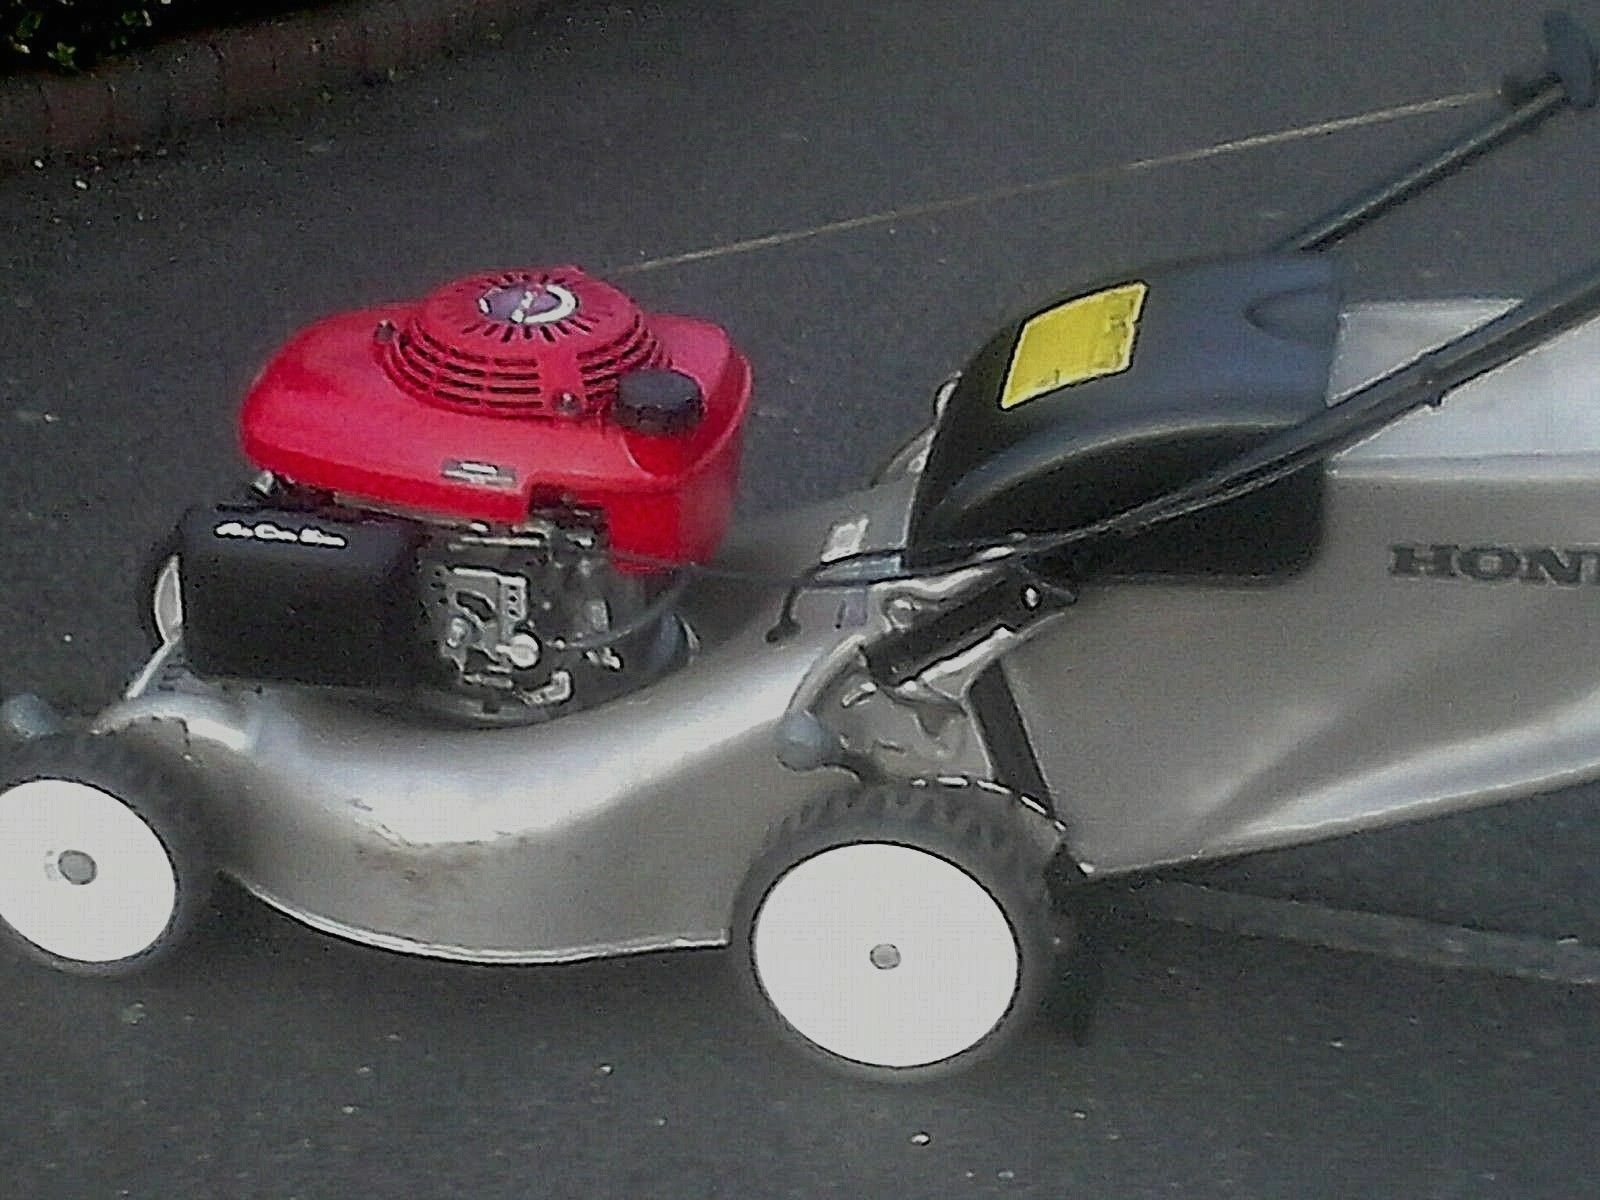 Honda Izy Hrg 415 PD Eco. 6 Piece Lawnmower Service Kit. Fits The GCV  Engine | eBay